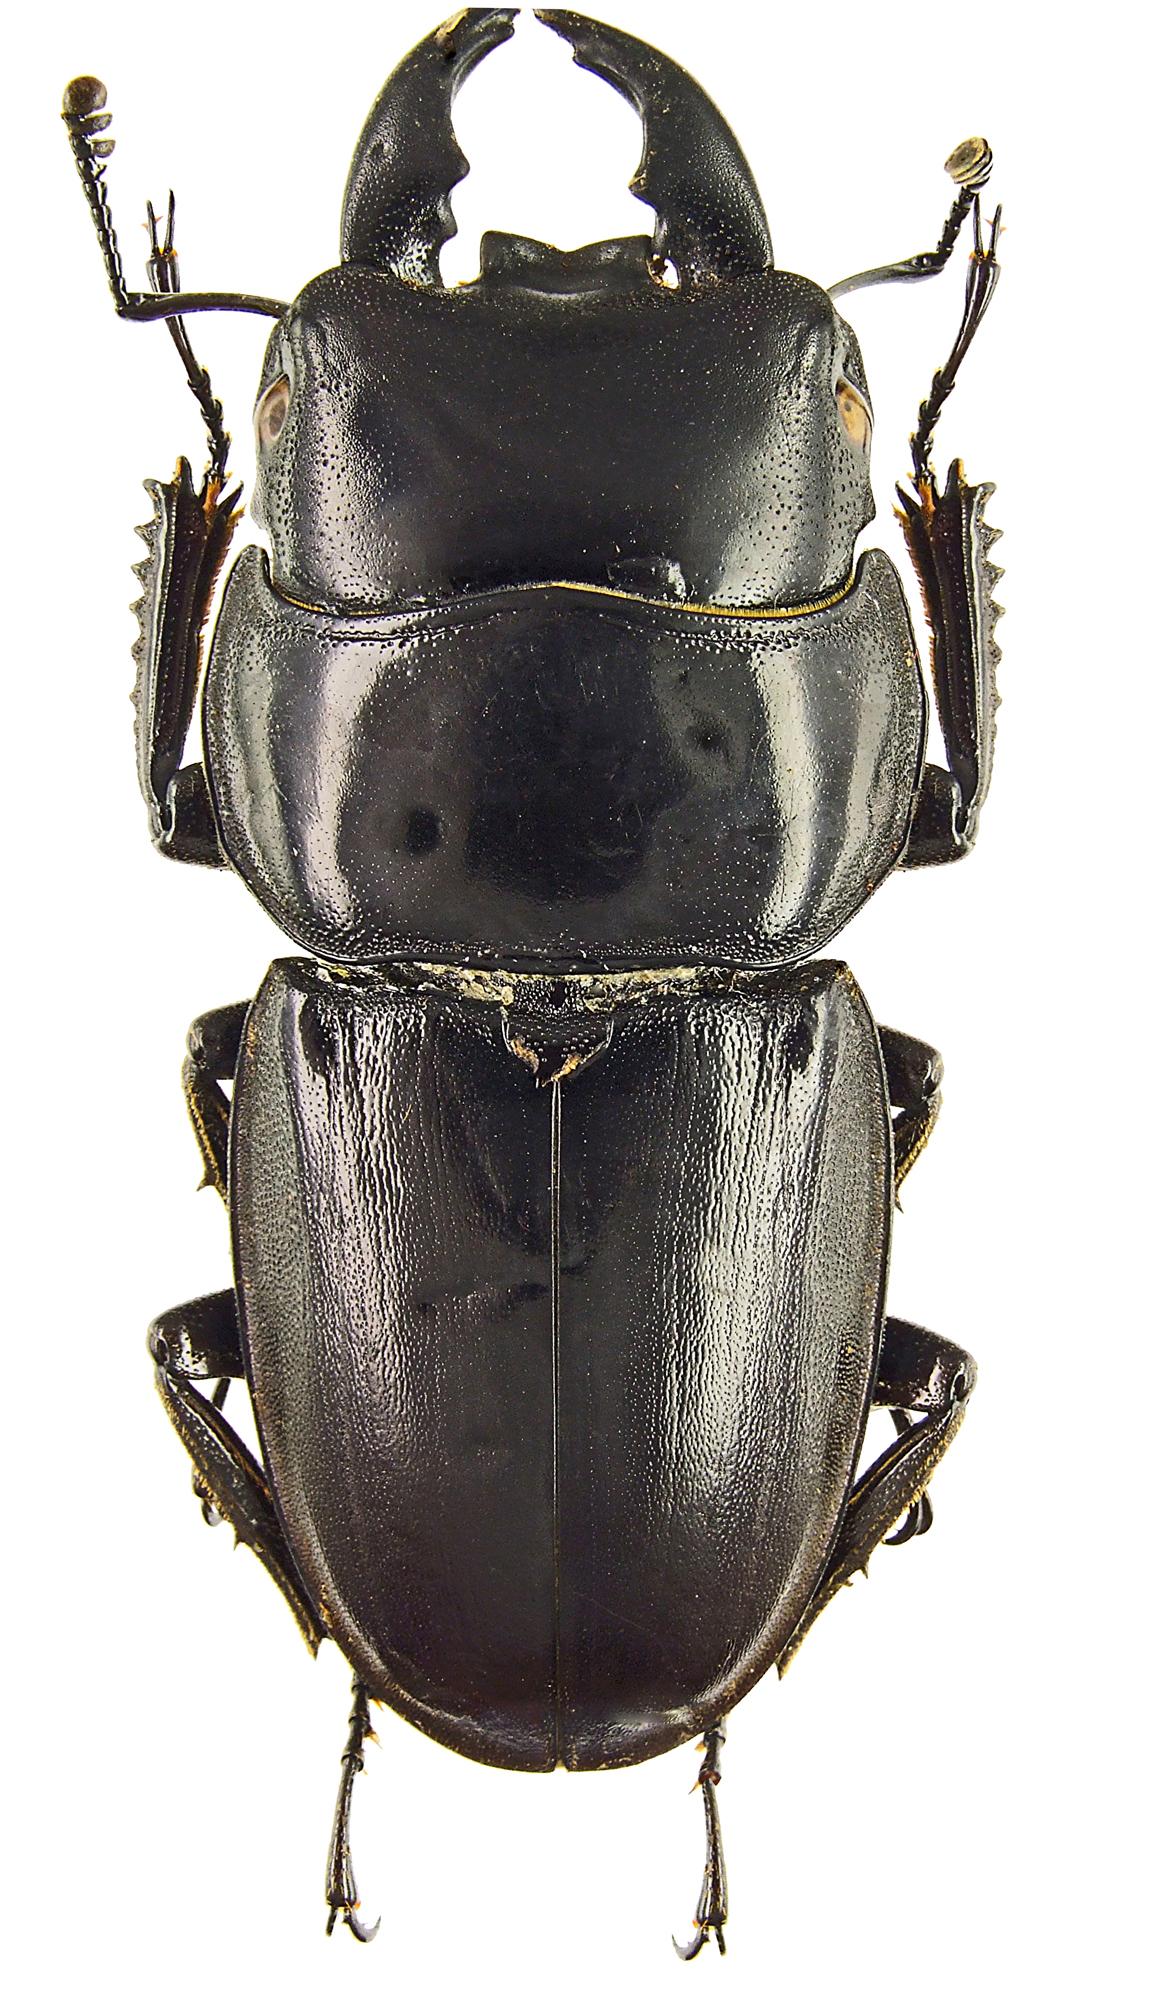 Serrognathus (Brontodorcus) alcides 43352cz54.jpg